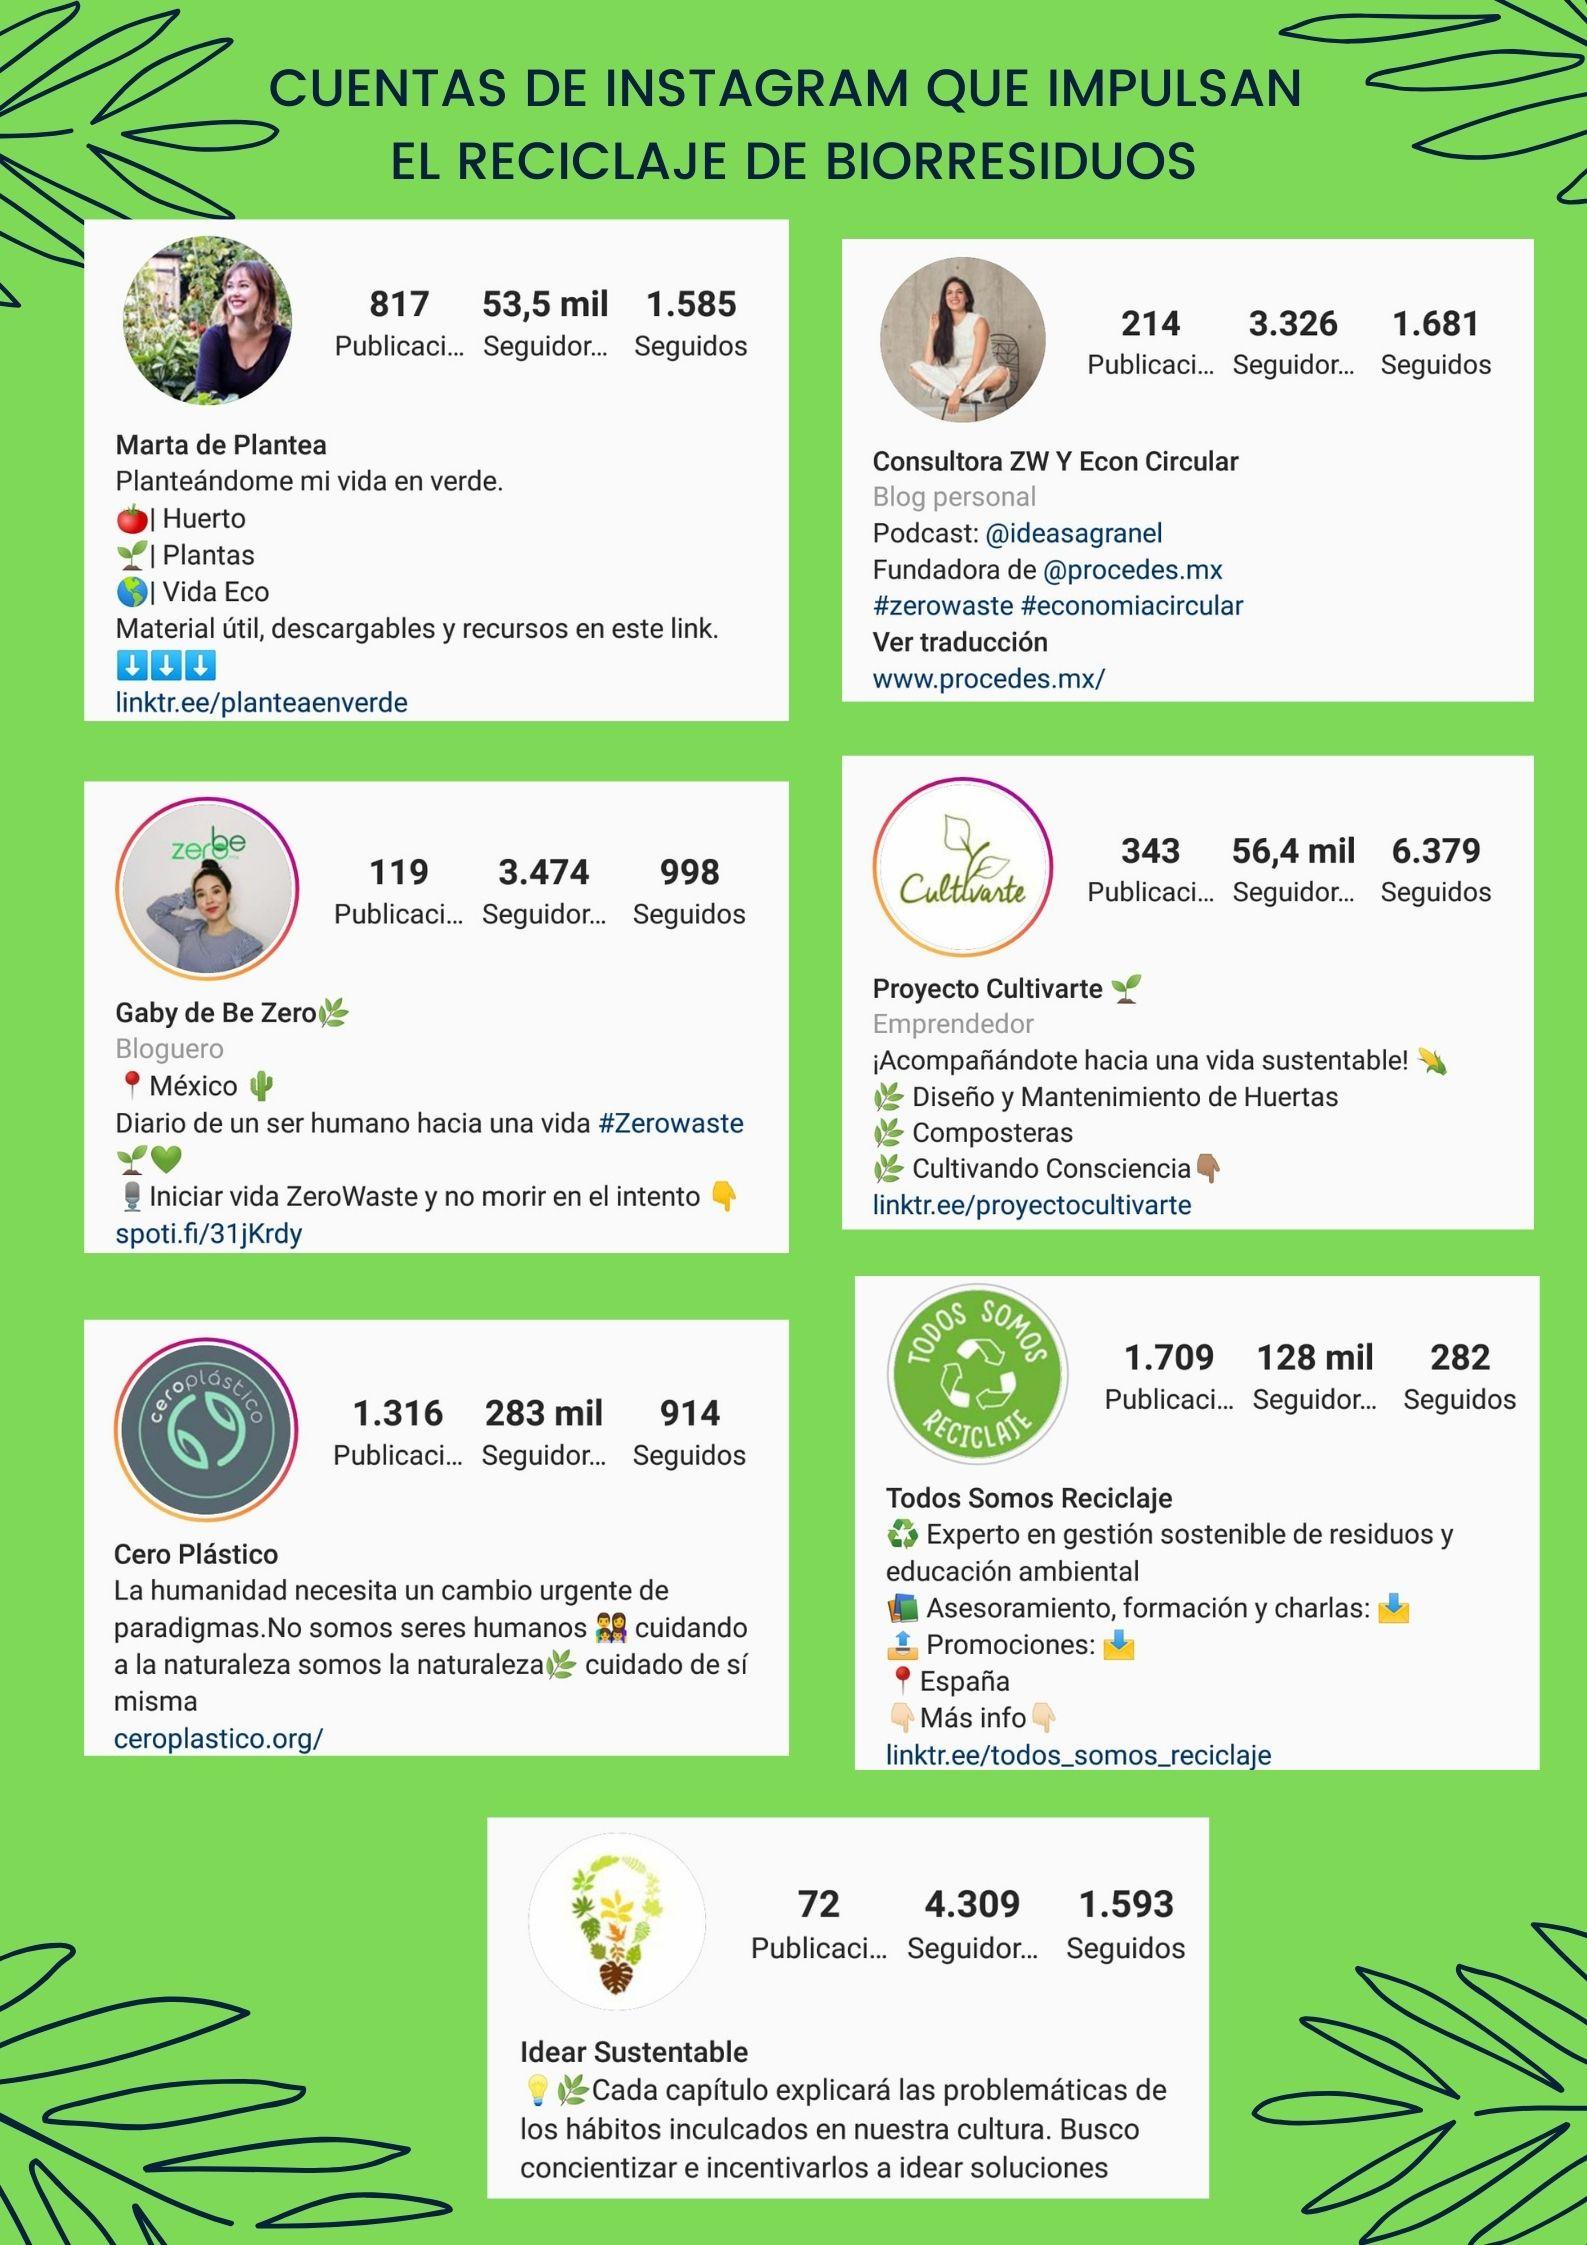 Redes sociales que promueven el reciclaje